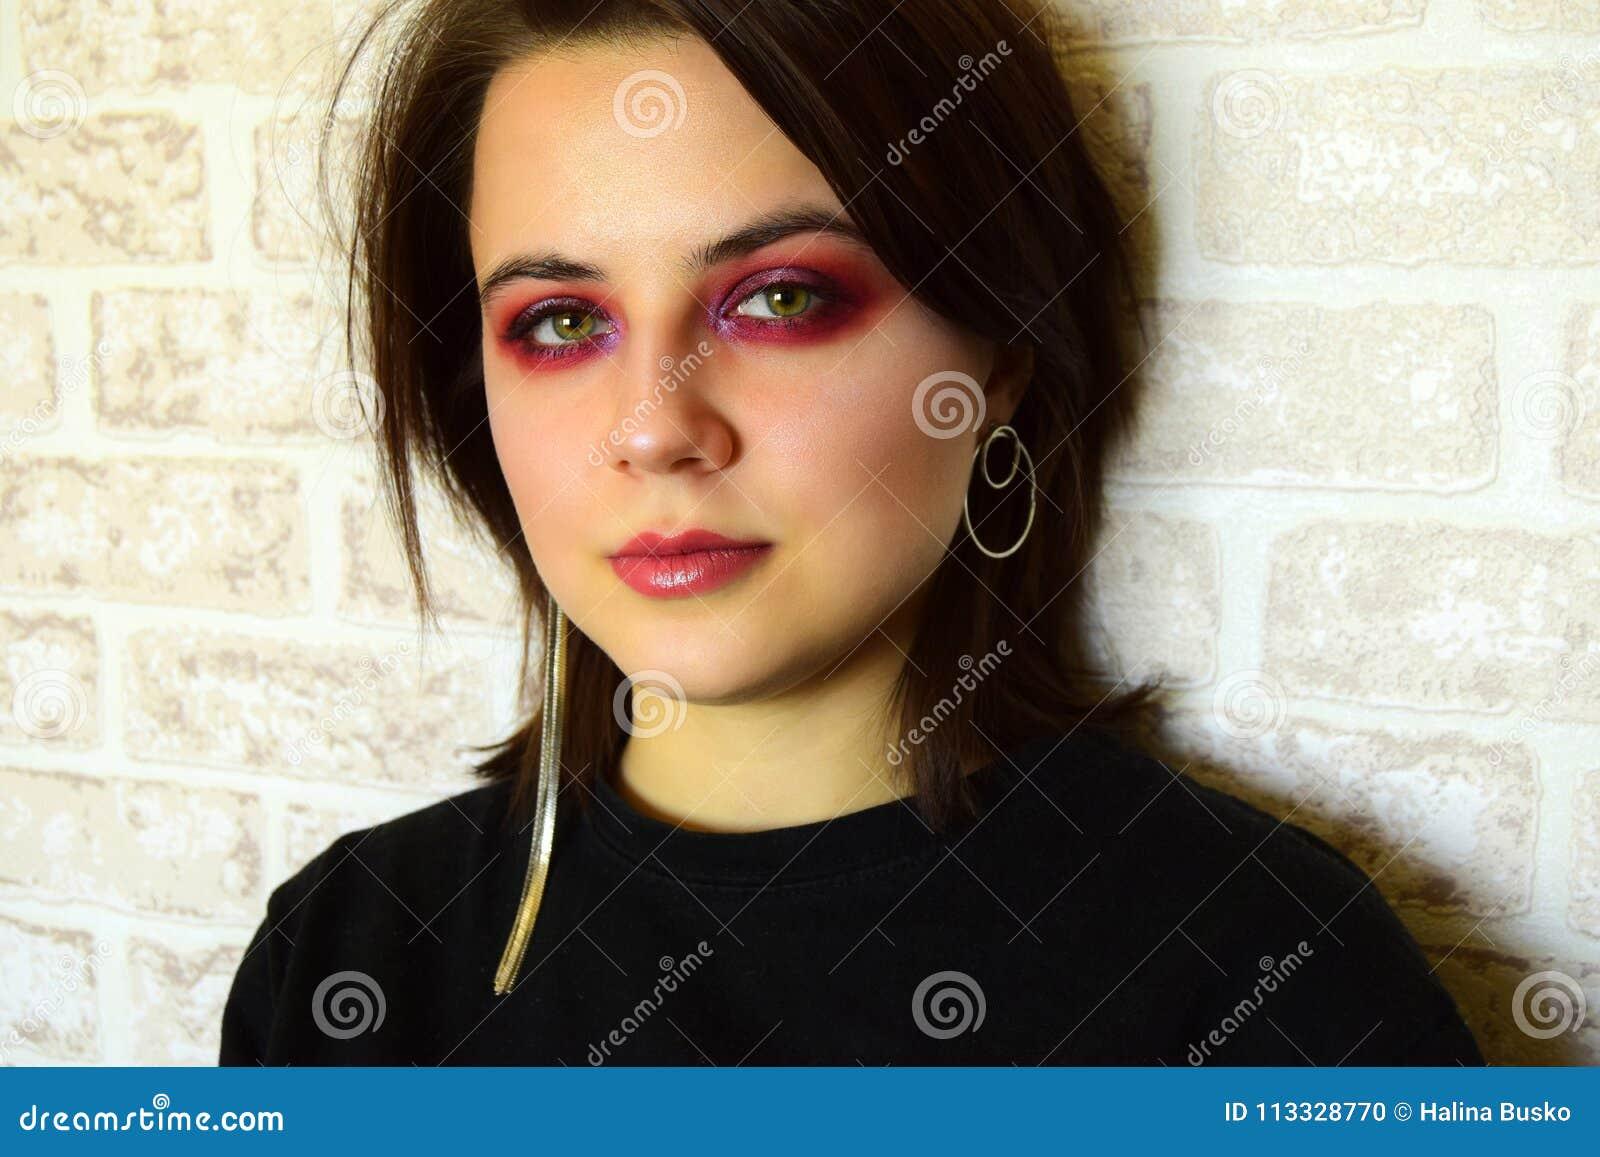 Крас ивый секс девочки имальчика